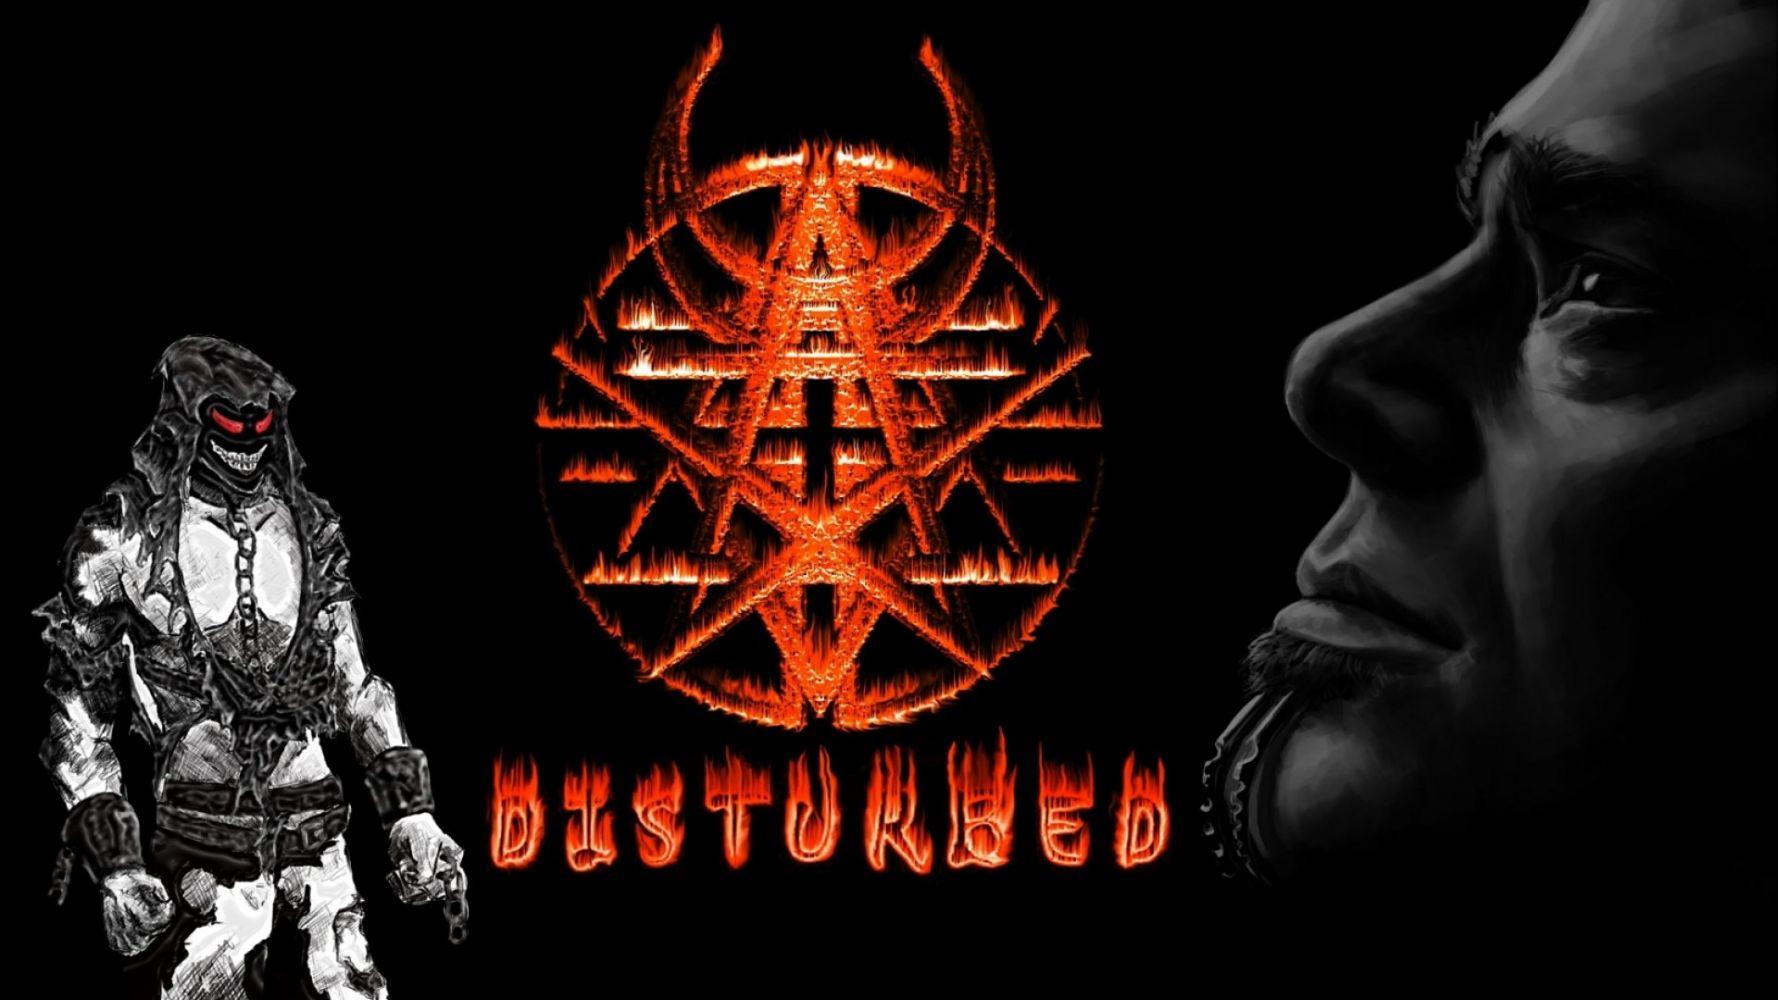 disturbed logo wallpaper - HD1778×1000